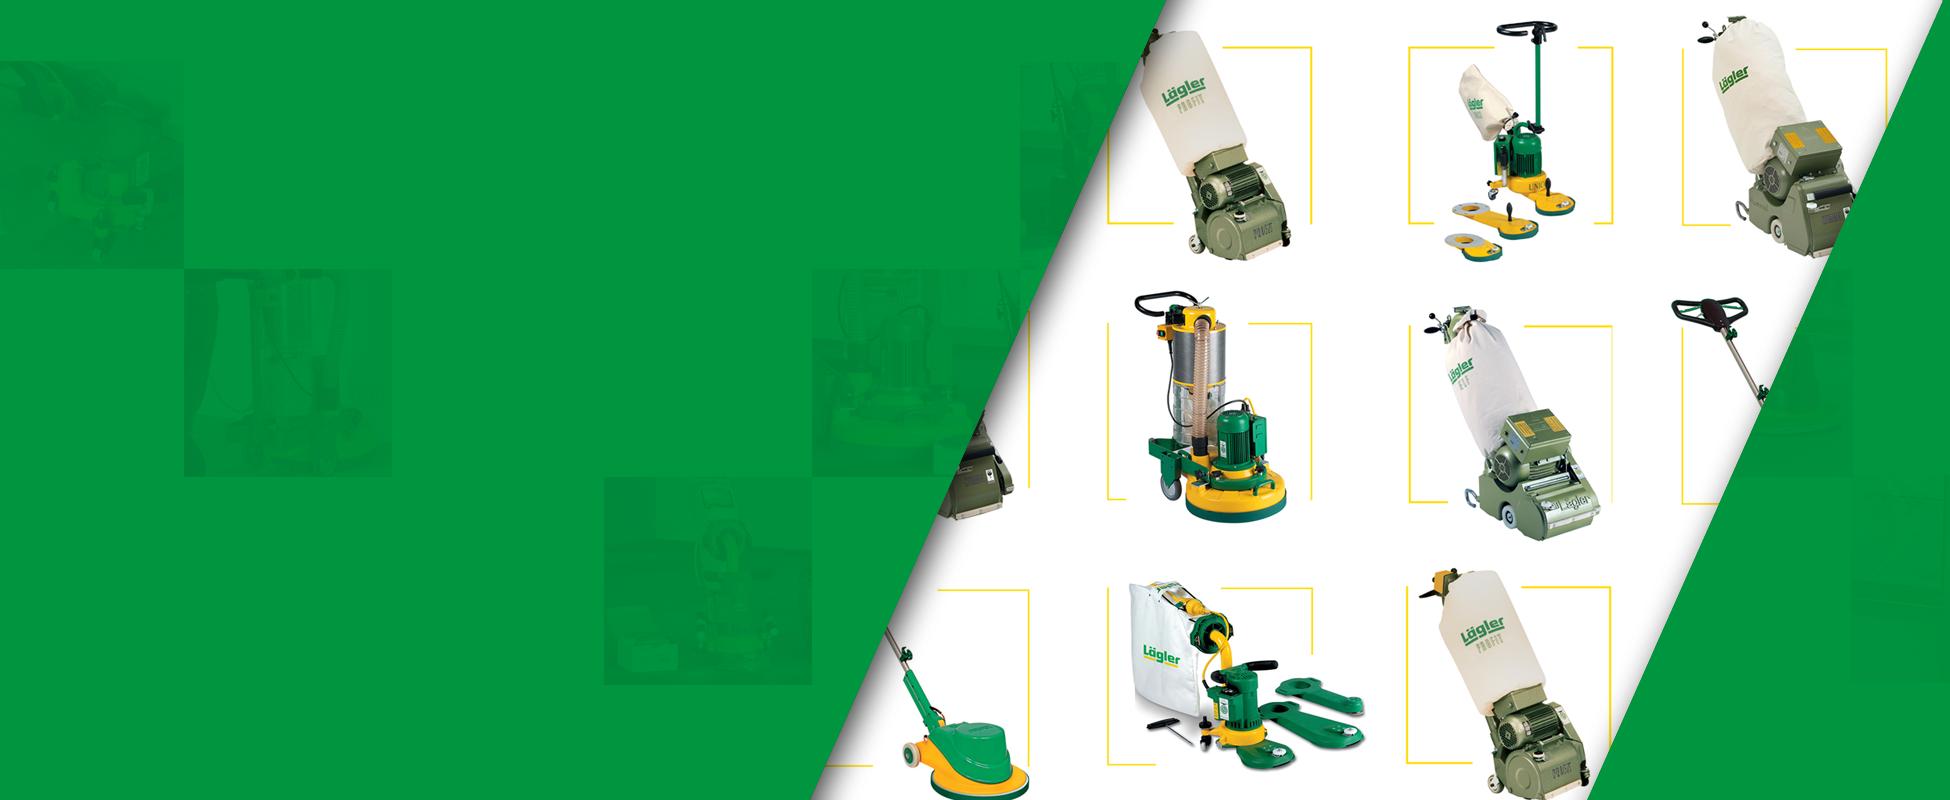 Lagler Edge Surface Drum and Belt Sanding Machines